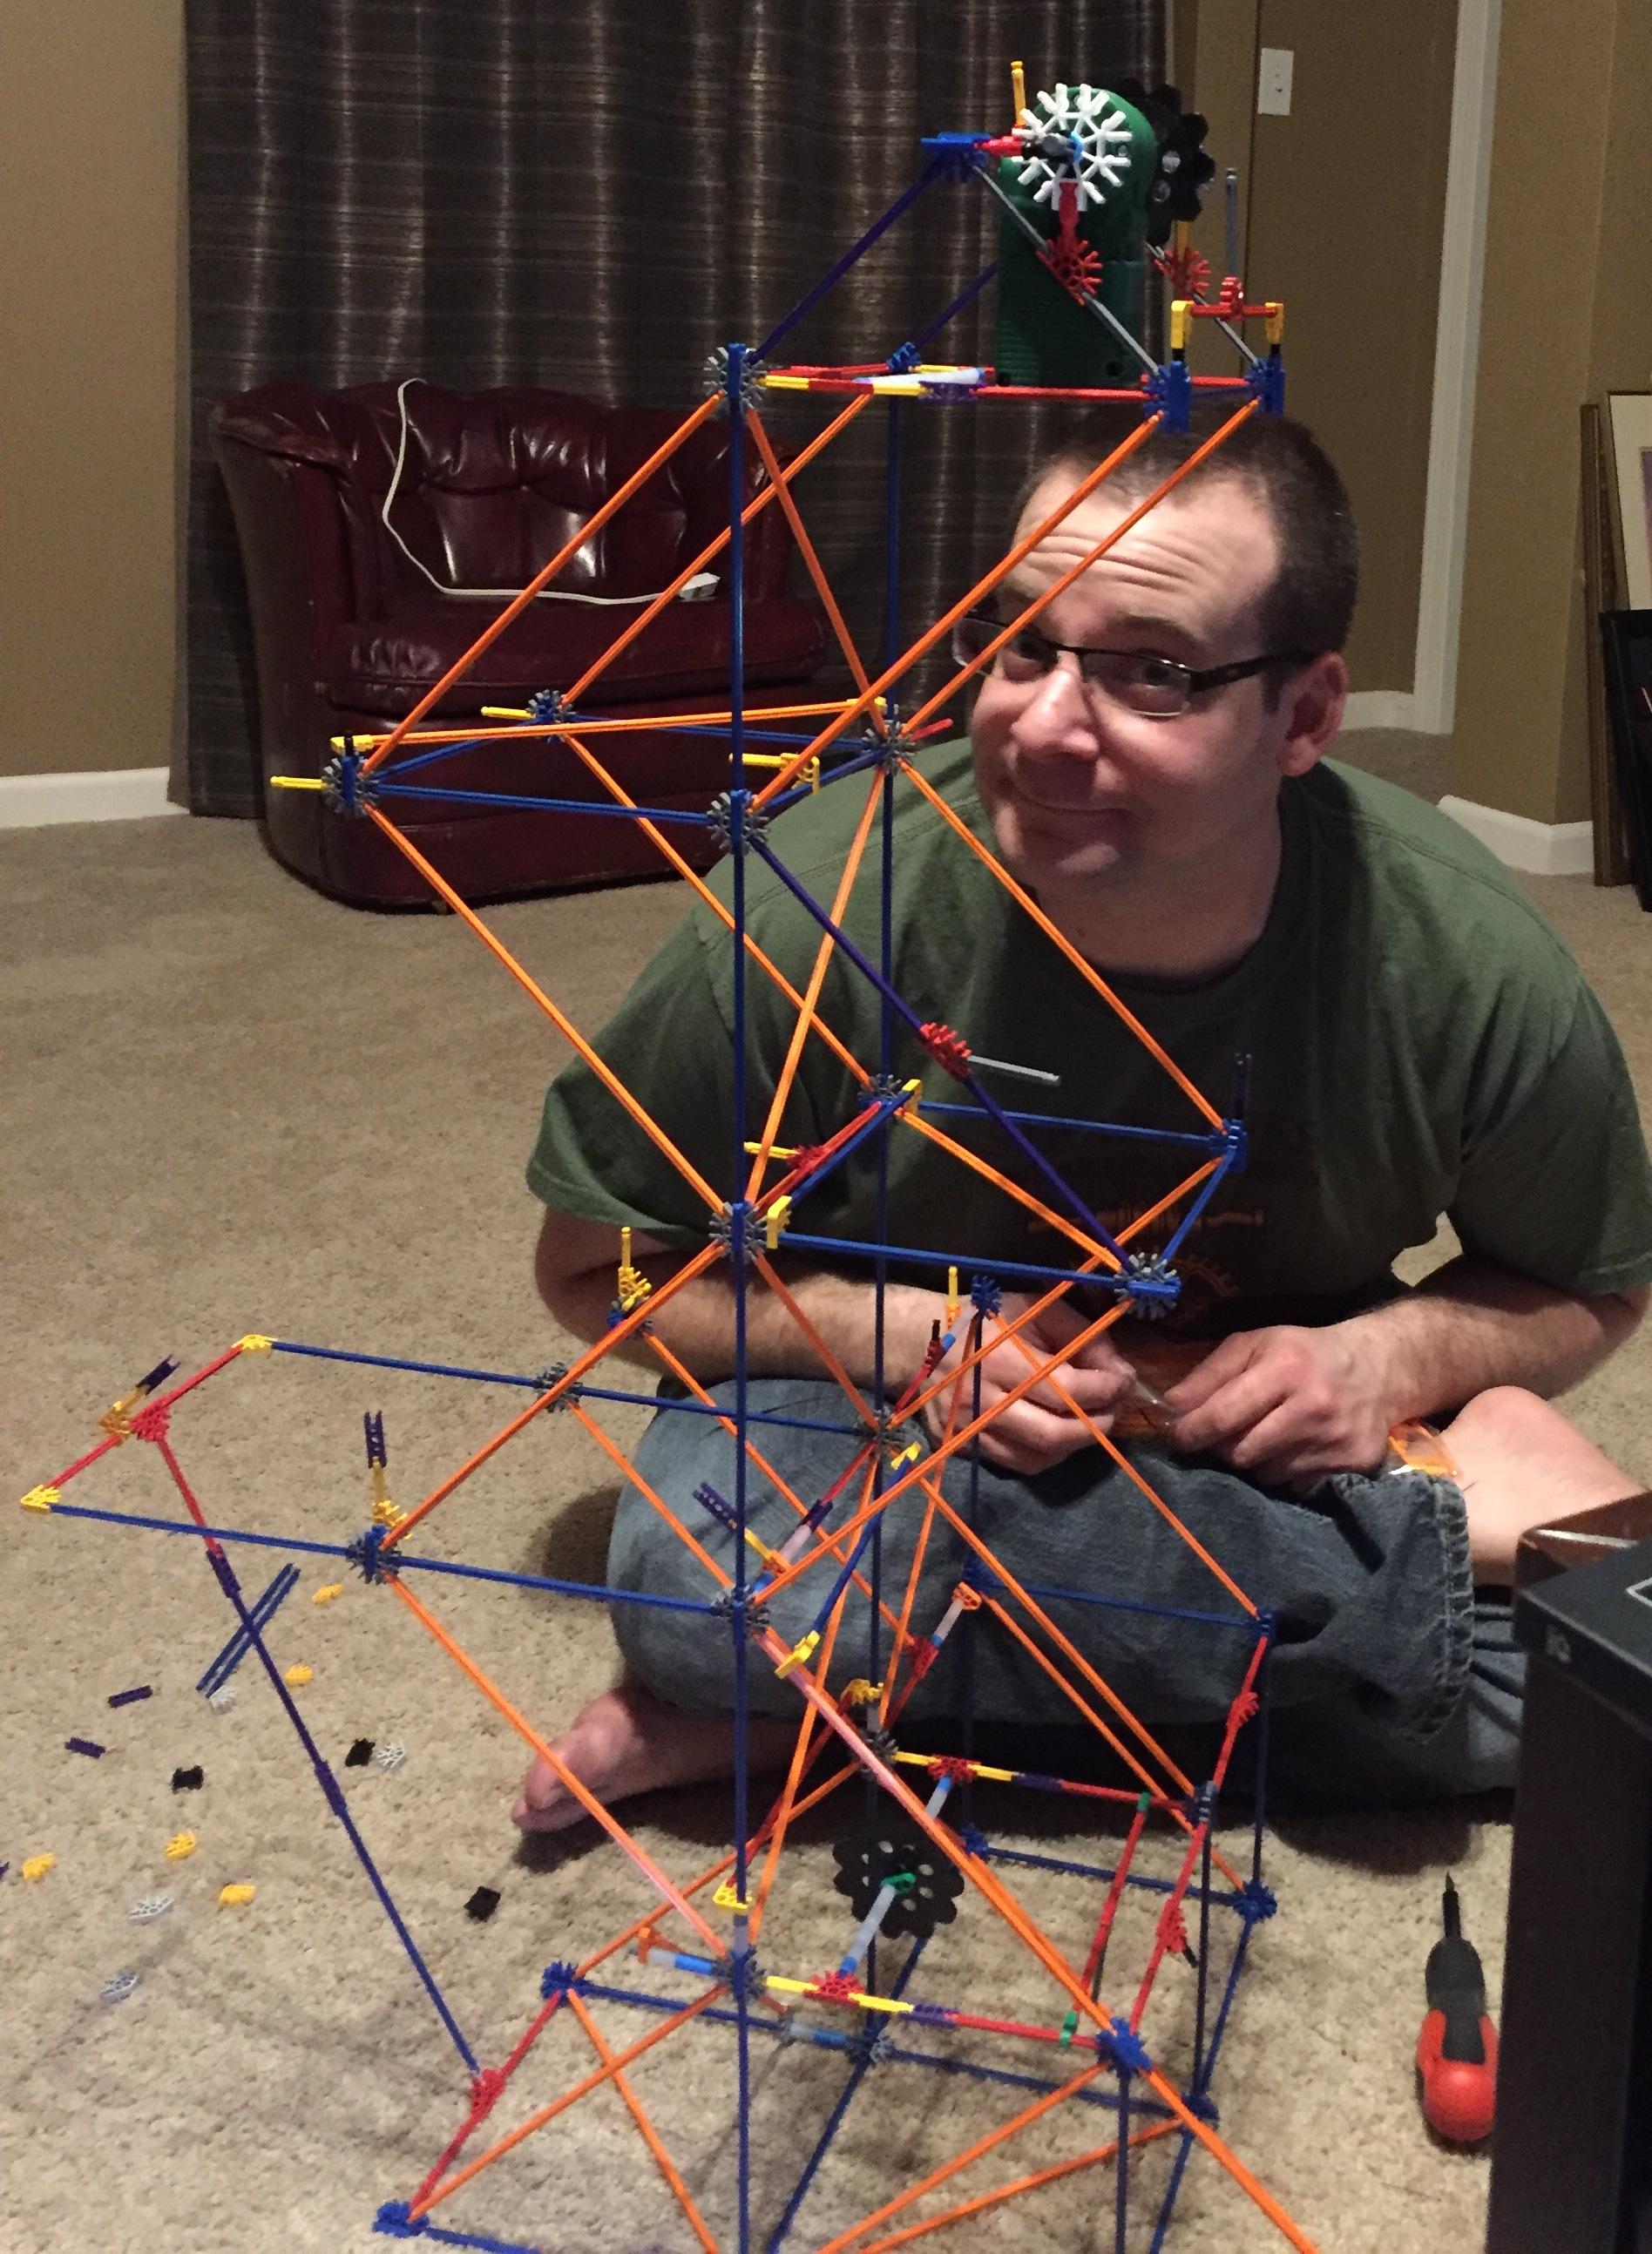 Steve playing with kinnex.JPG